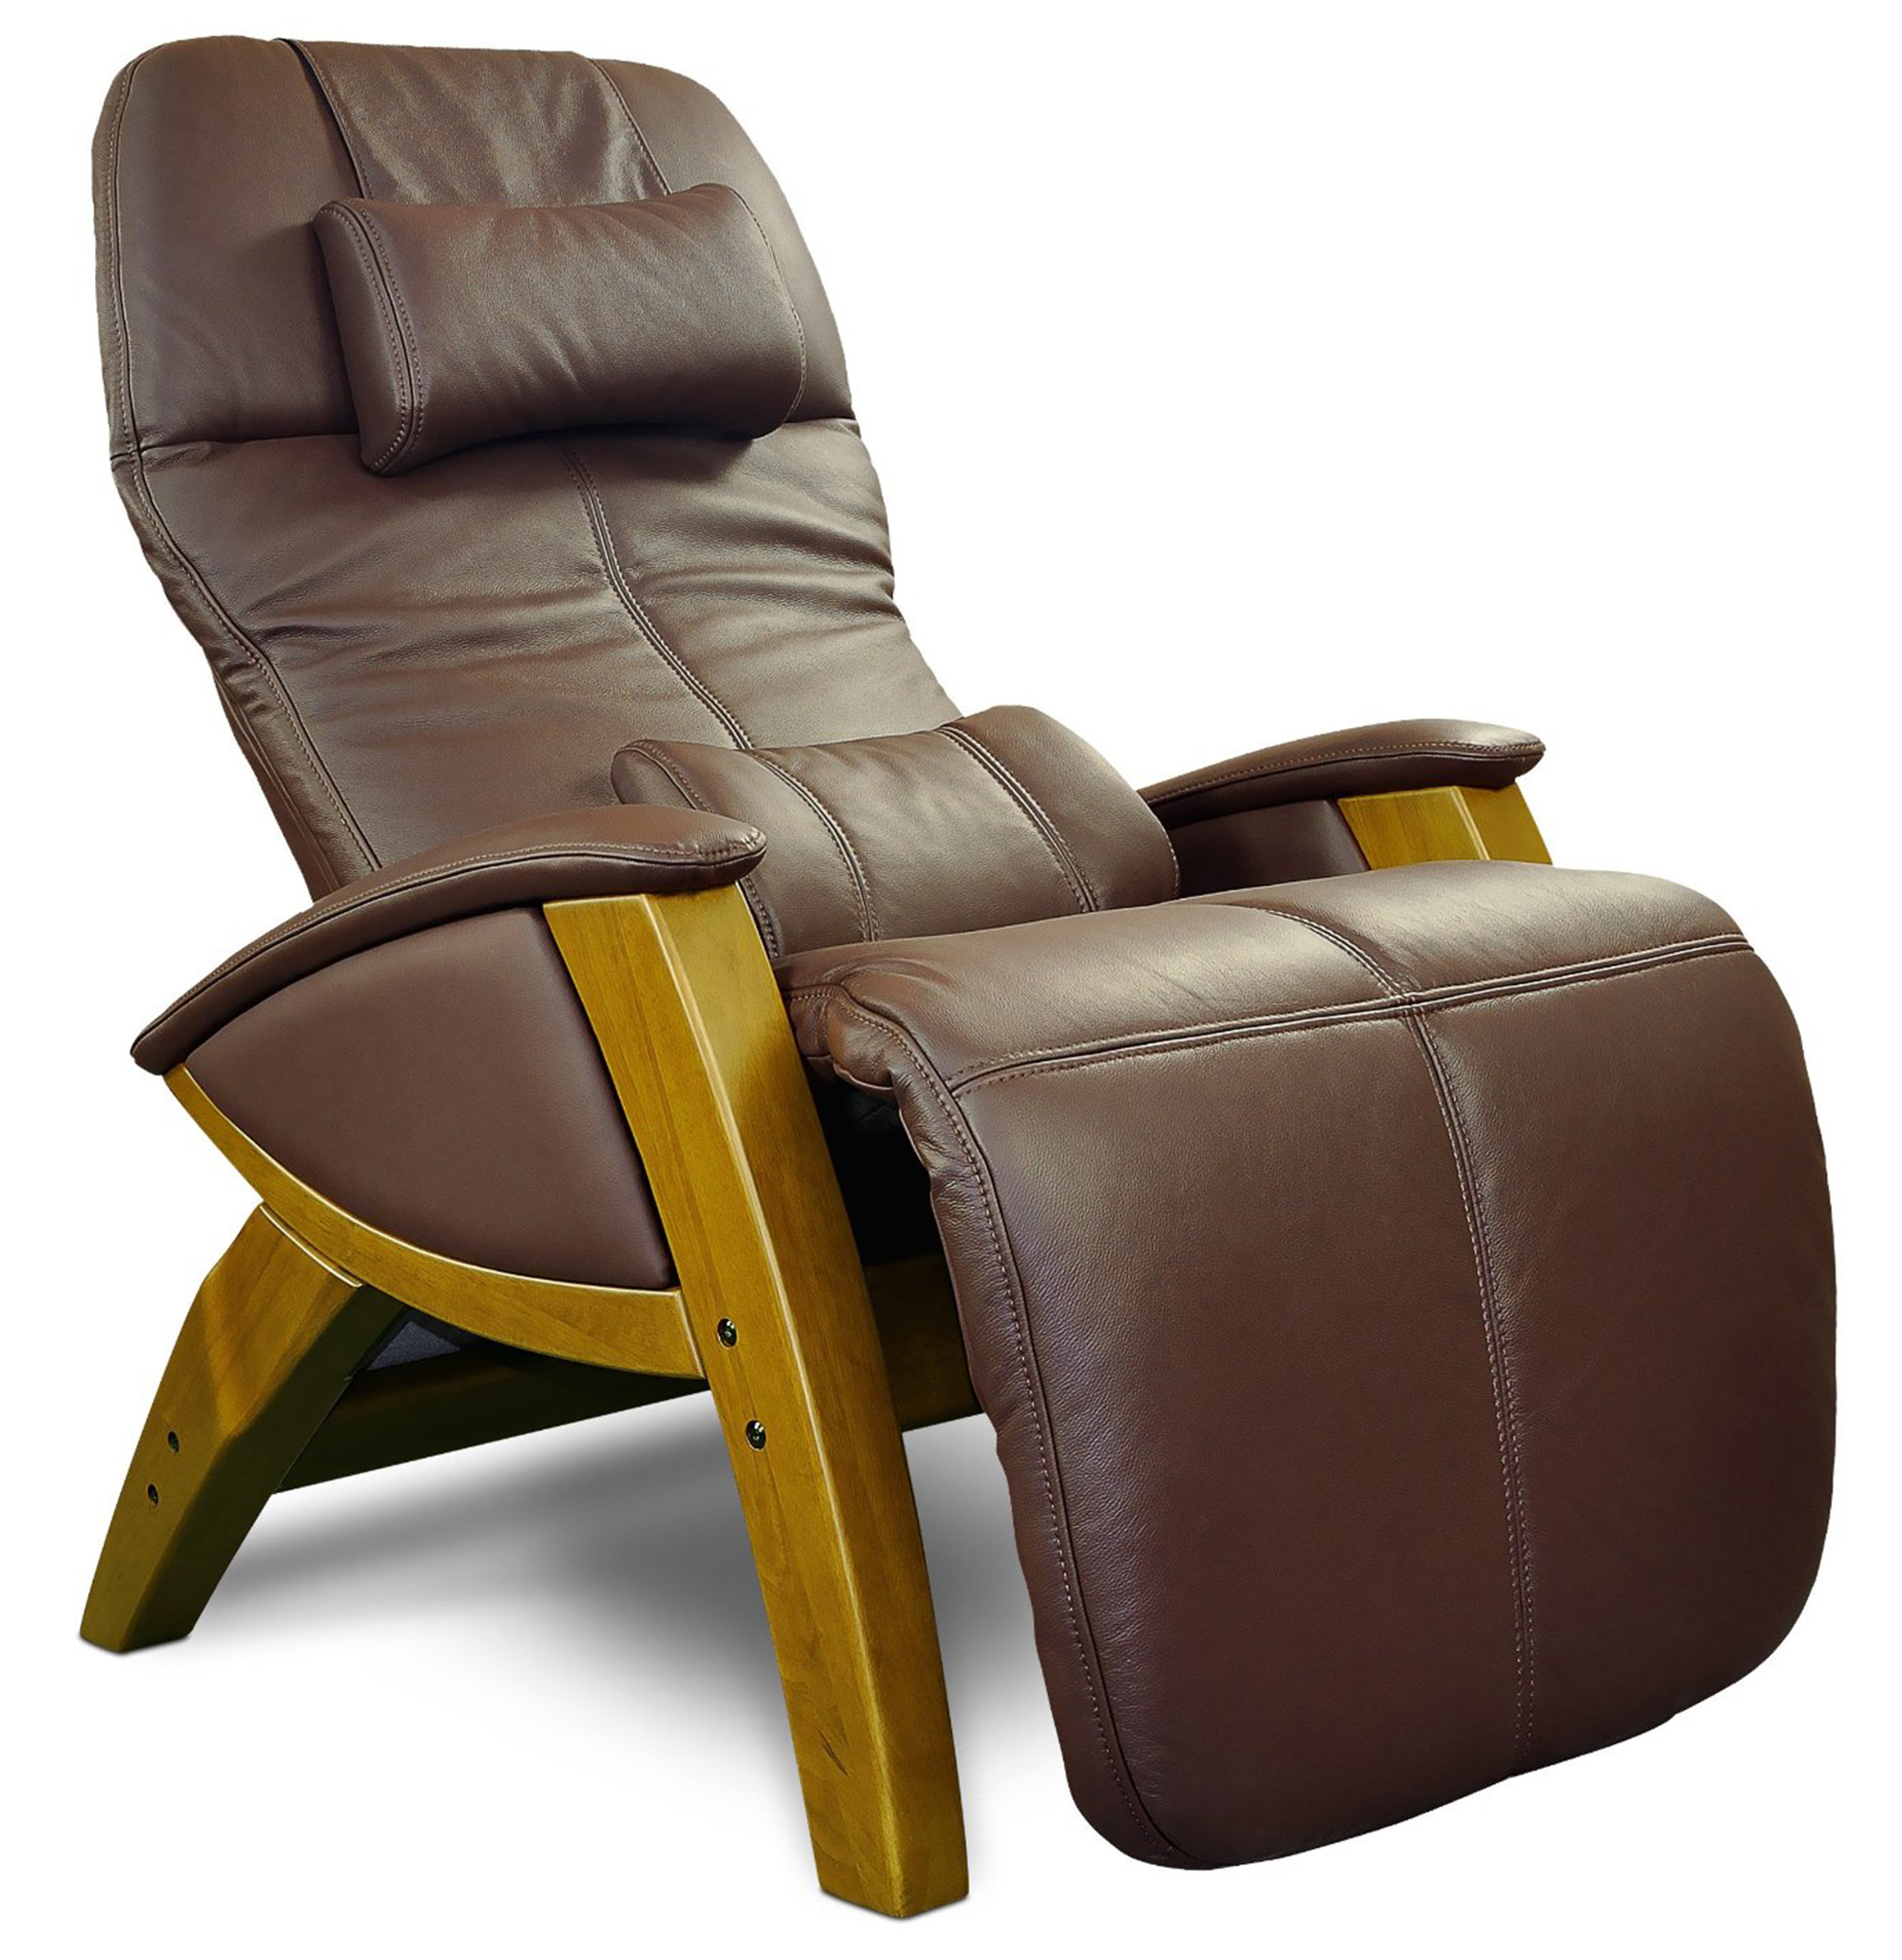 svago sv410 benessere chair chocolate leather zero gravity recliner